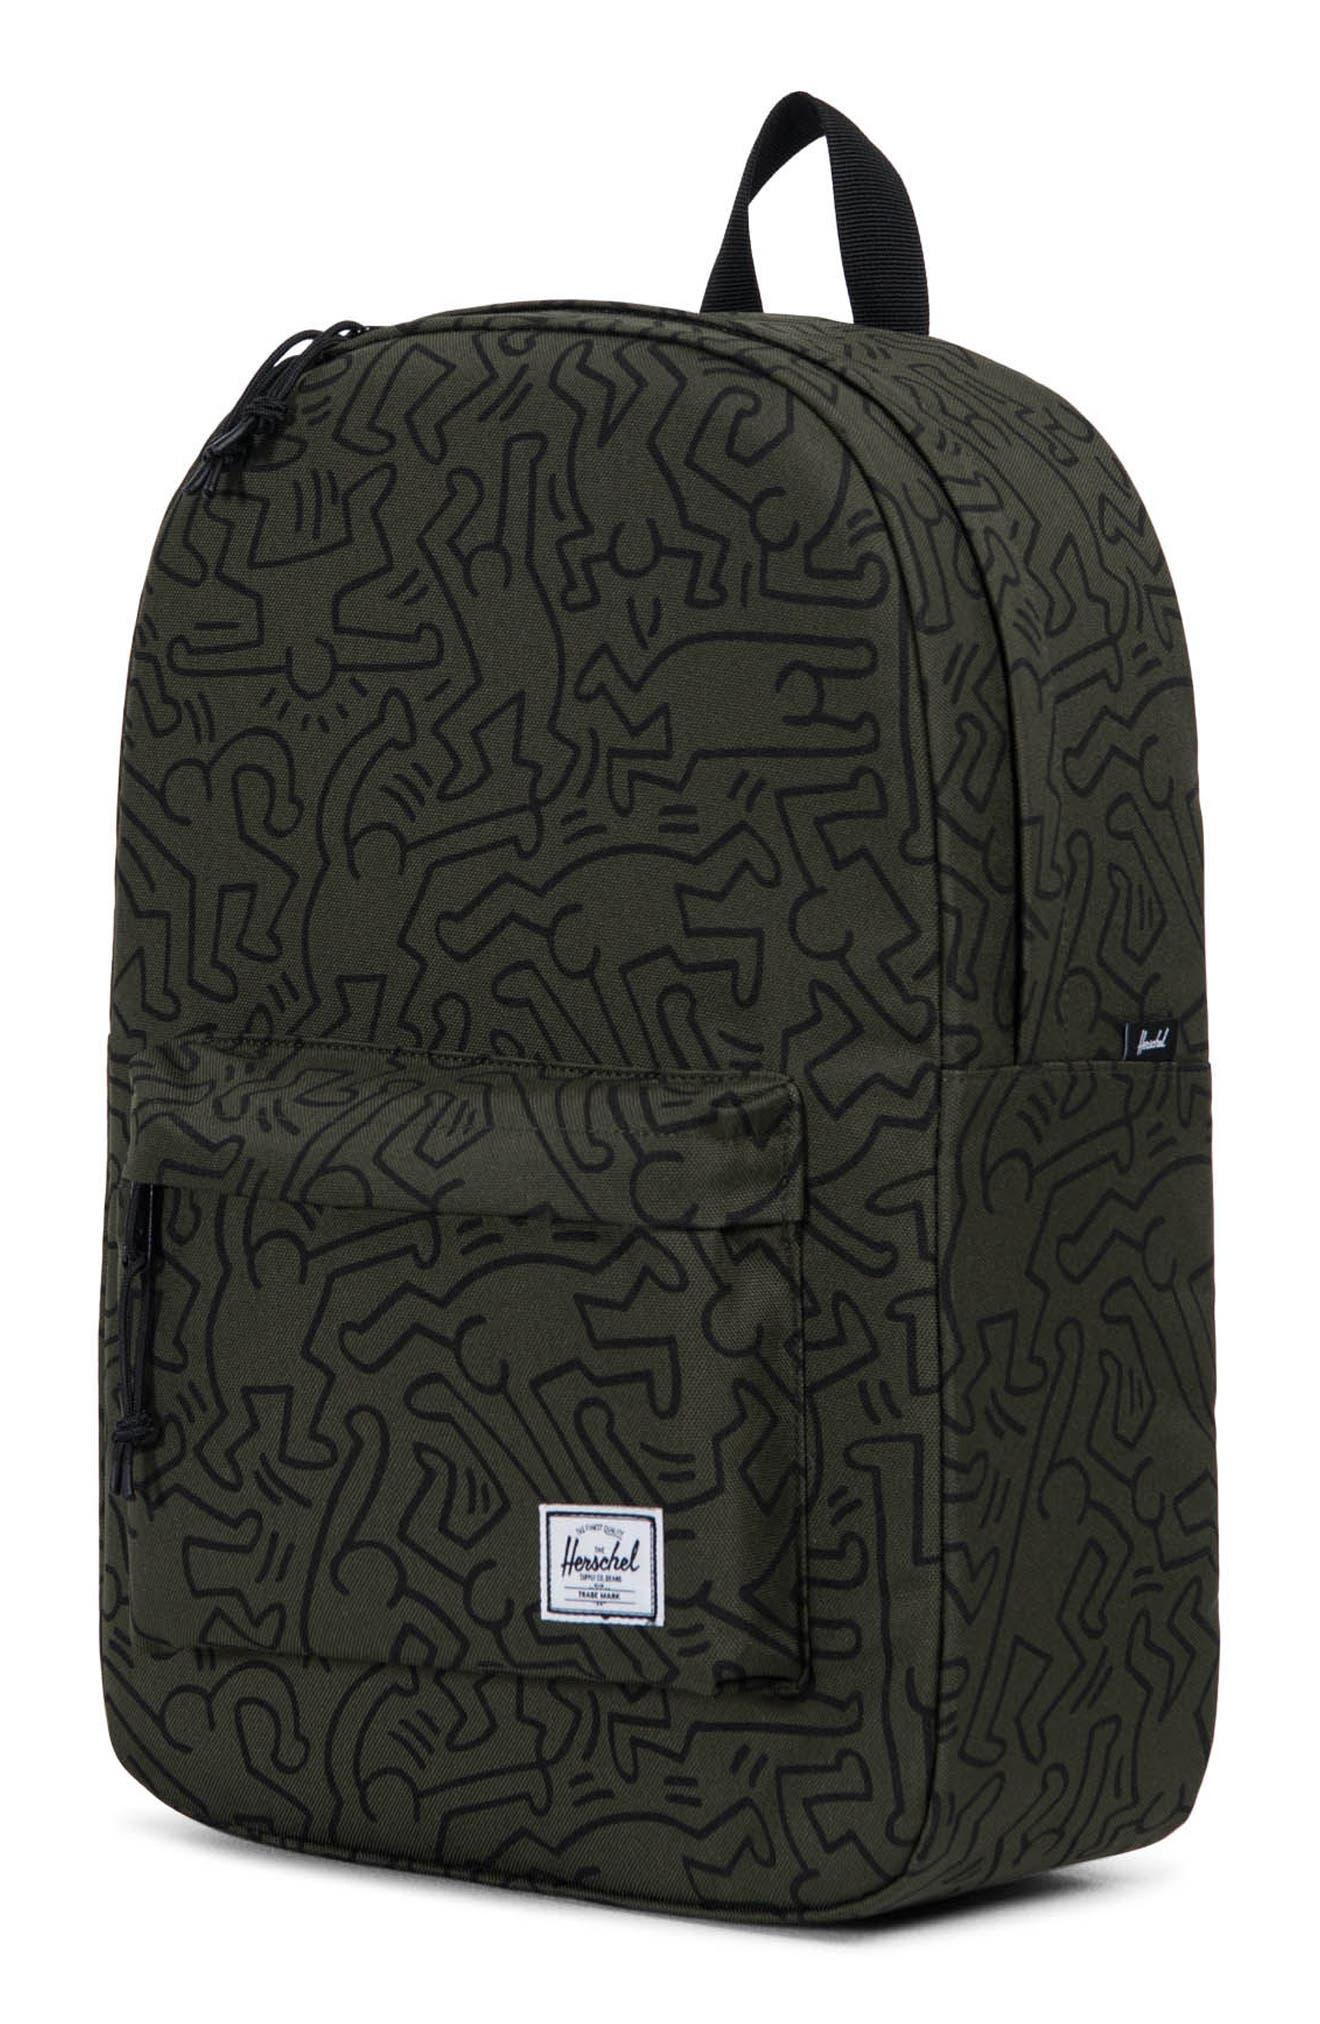 Winlaw x Keith Haring Backpack,                             Main thumbnail 1, color,